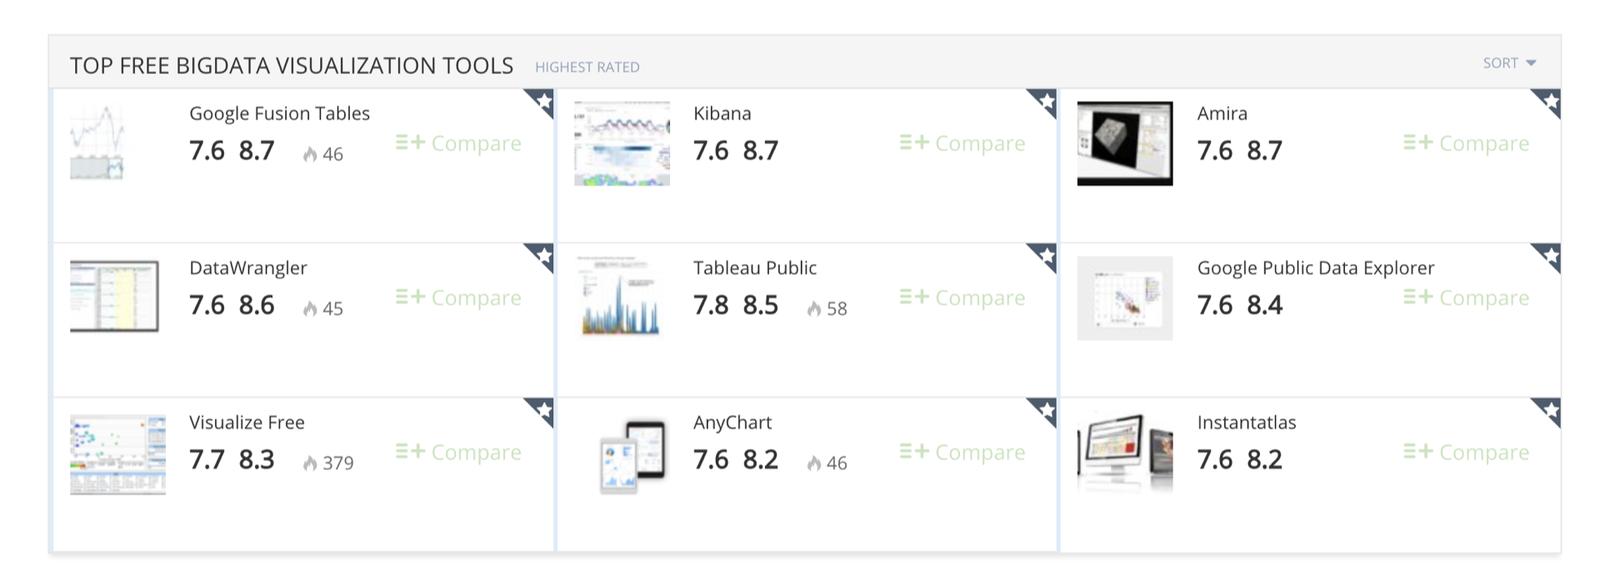 Top free big data visualization tools